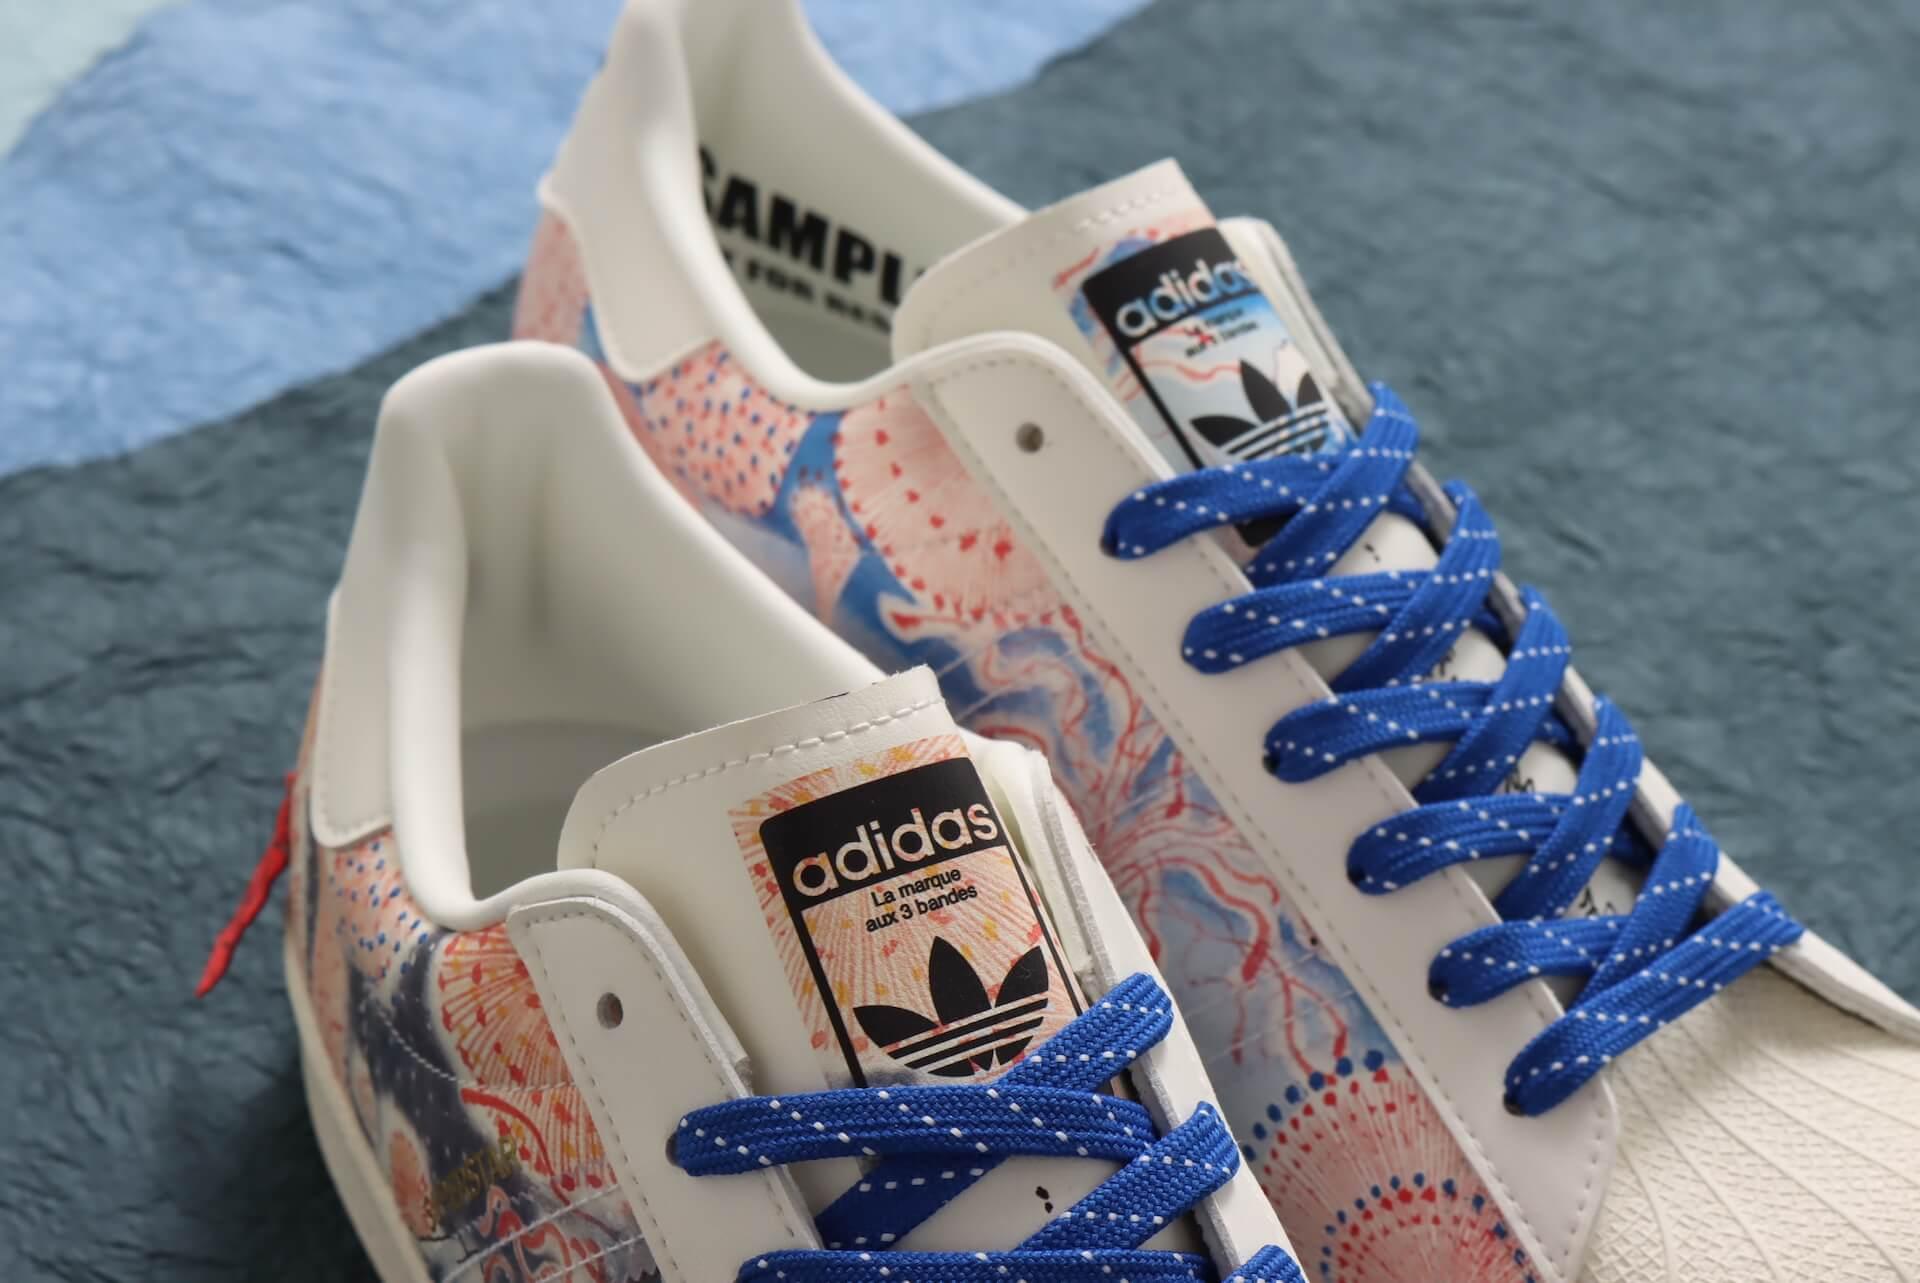 adidas OriginalsとThree Tides Tattoo、atmosのコラボスニーカーが登場!和柄を落とし込んだSUPERSTARが発売決定 life210301_adidas_ttt_4